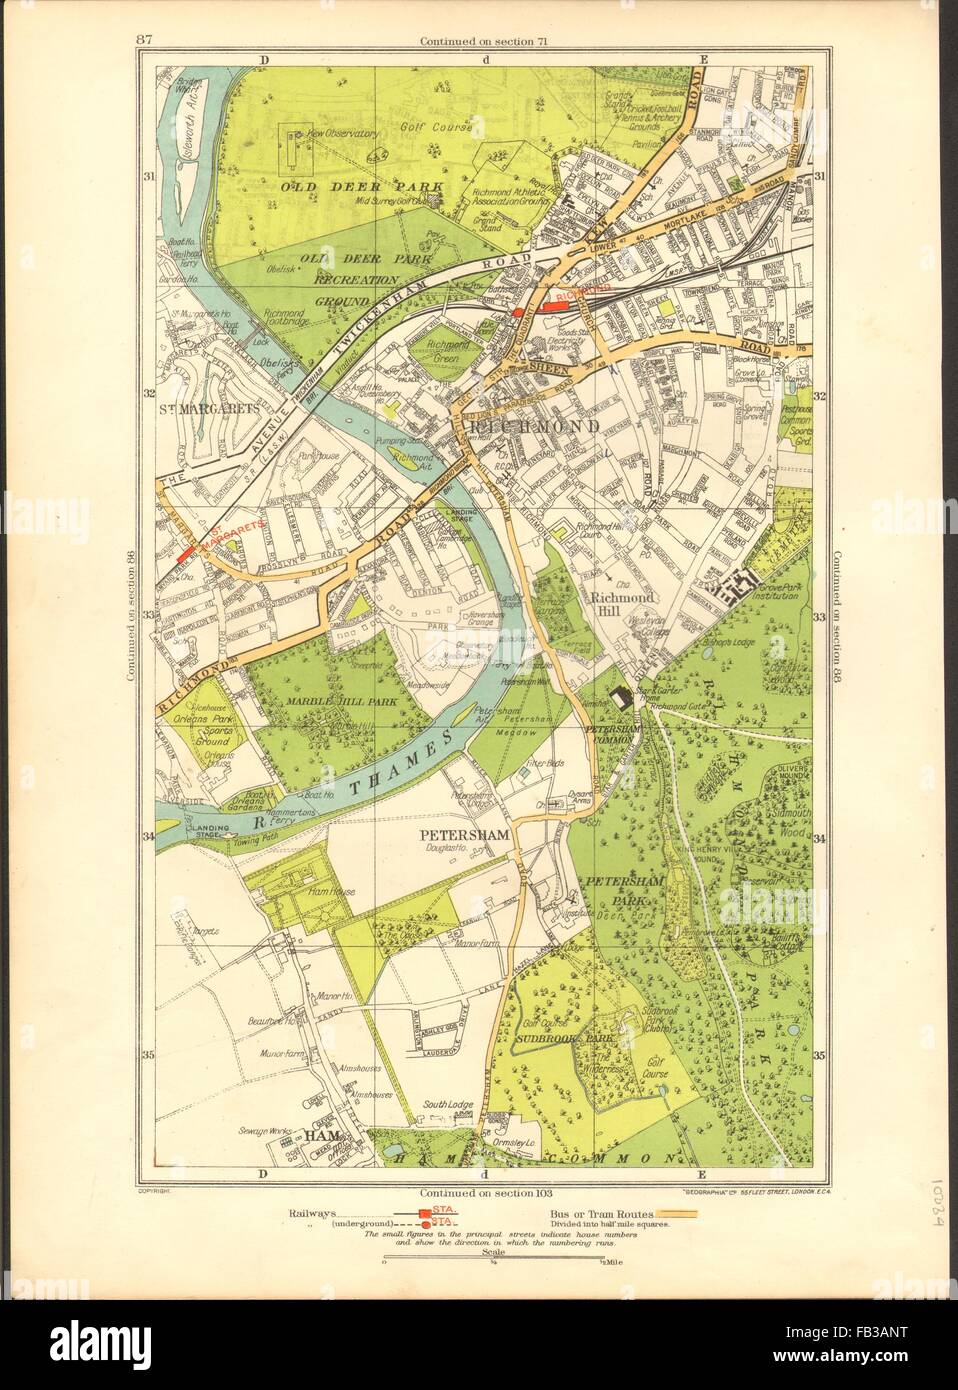 Richmond London Map.London Ham Petersham Richmond Richmond Hill St Margaret S 1937